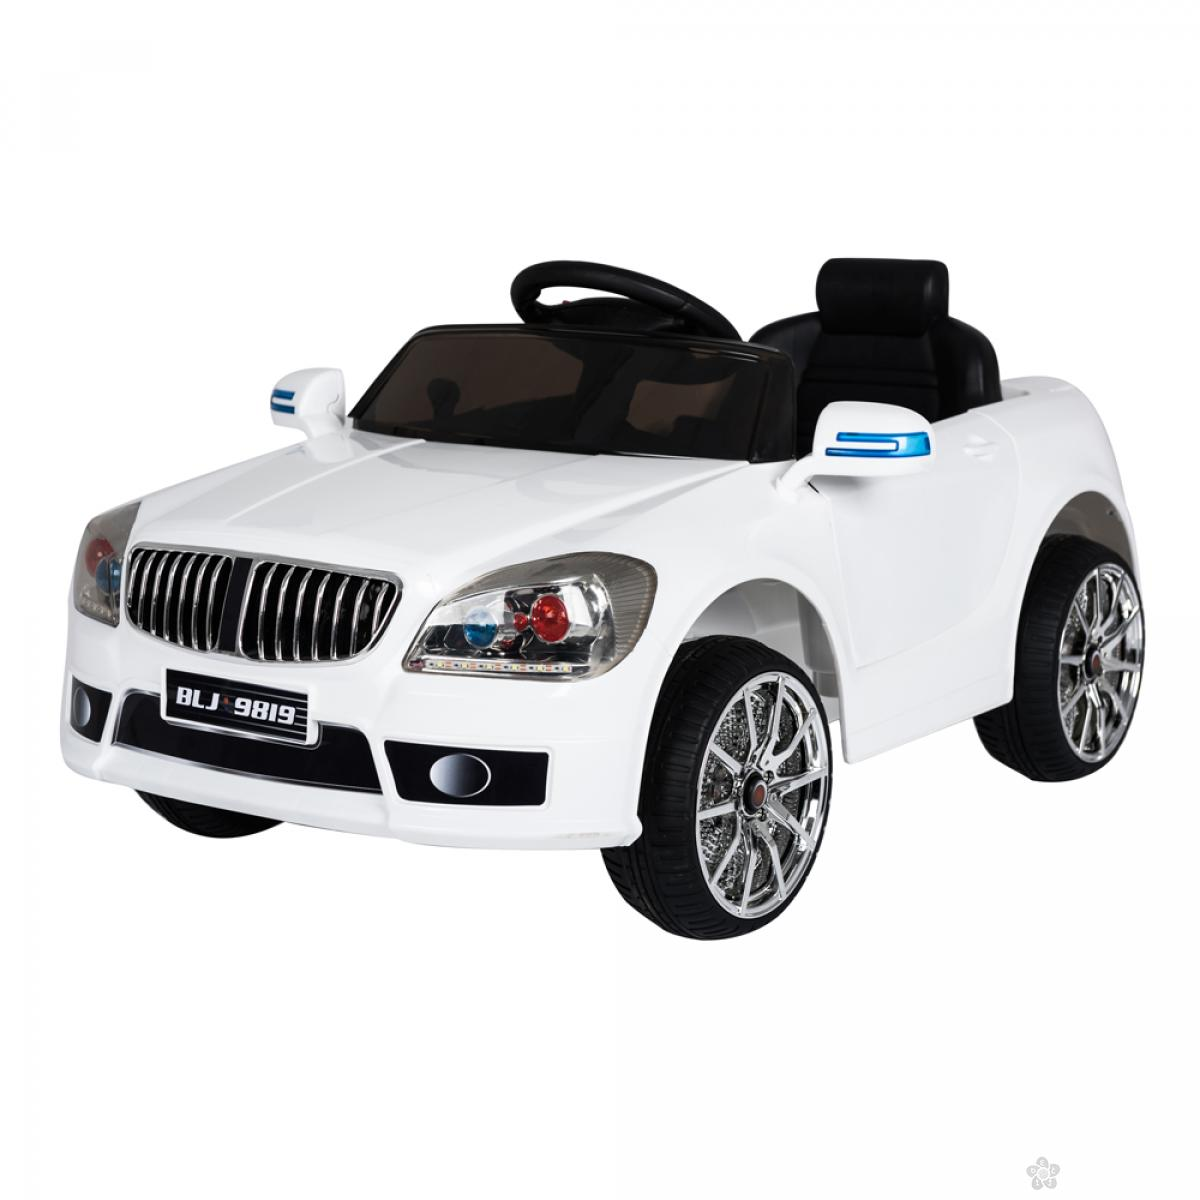 Auto za decu, model 276aris, beli